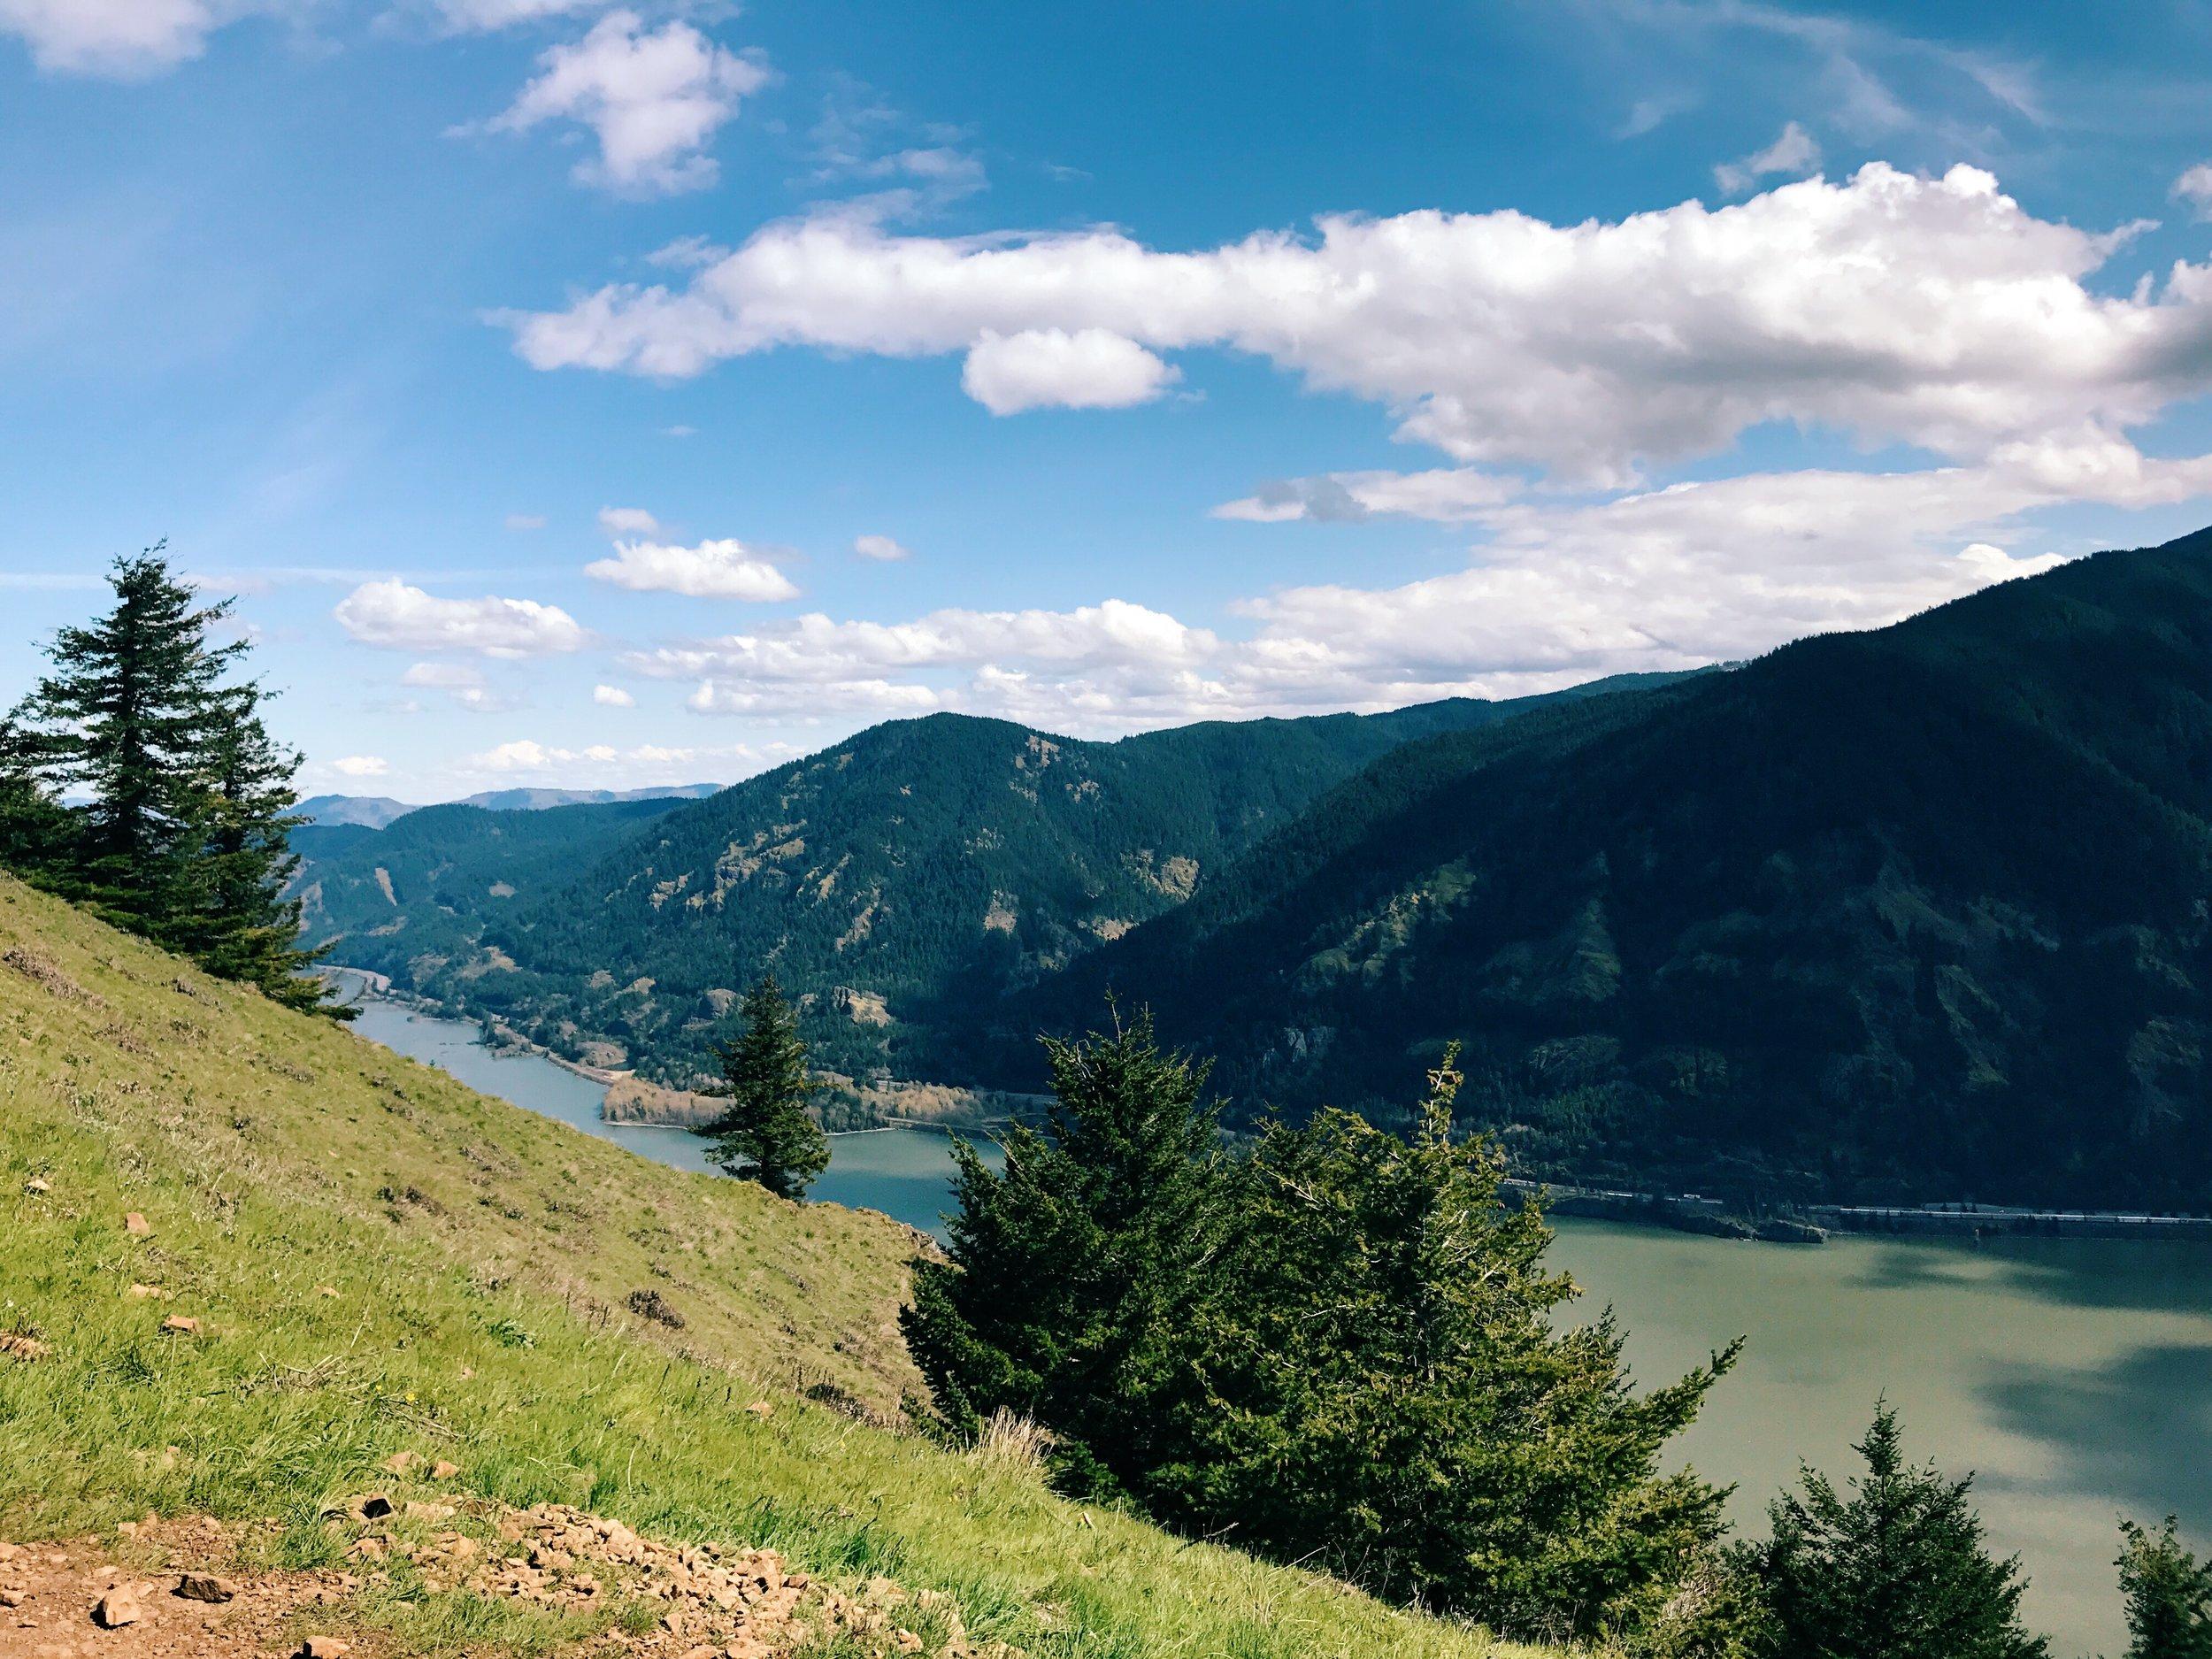 Hike up Dog Mountain